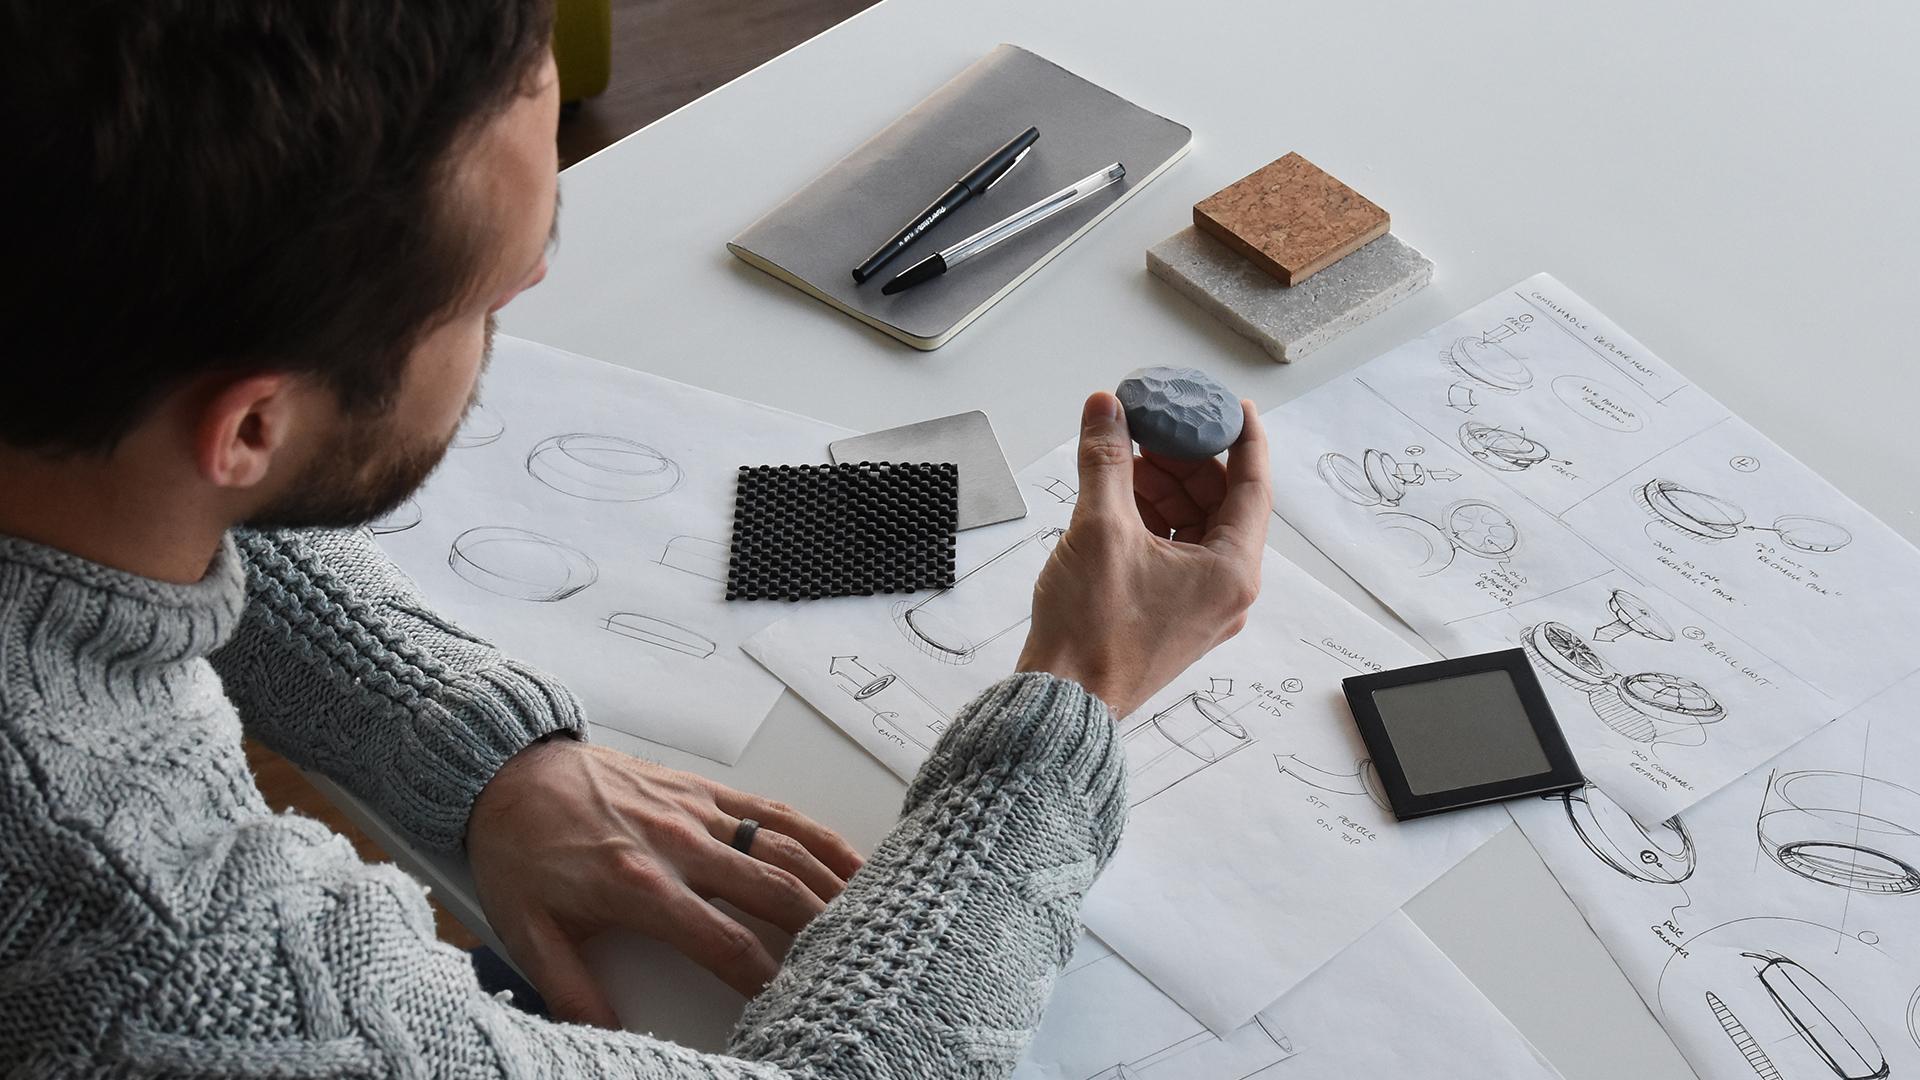 PEBL Cambridge Consultants Design Process Image 2